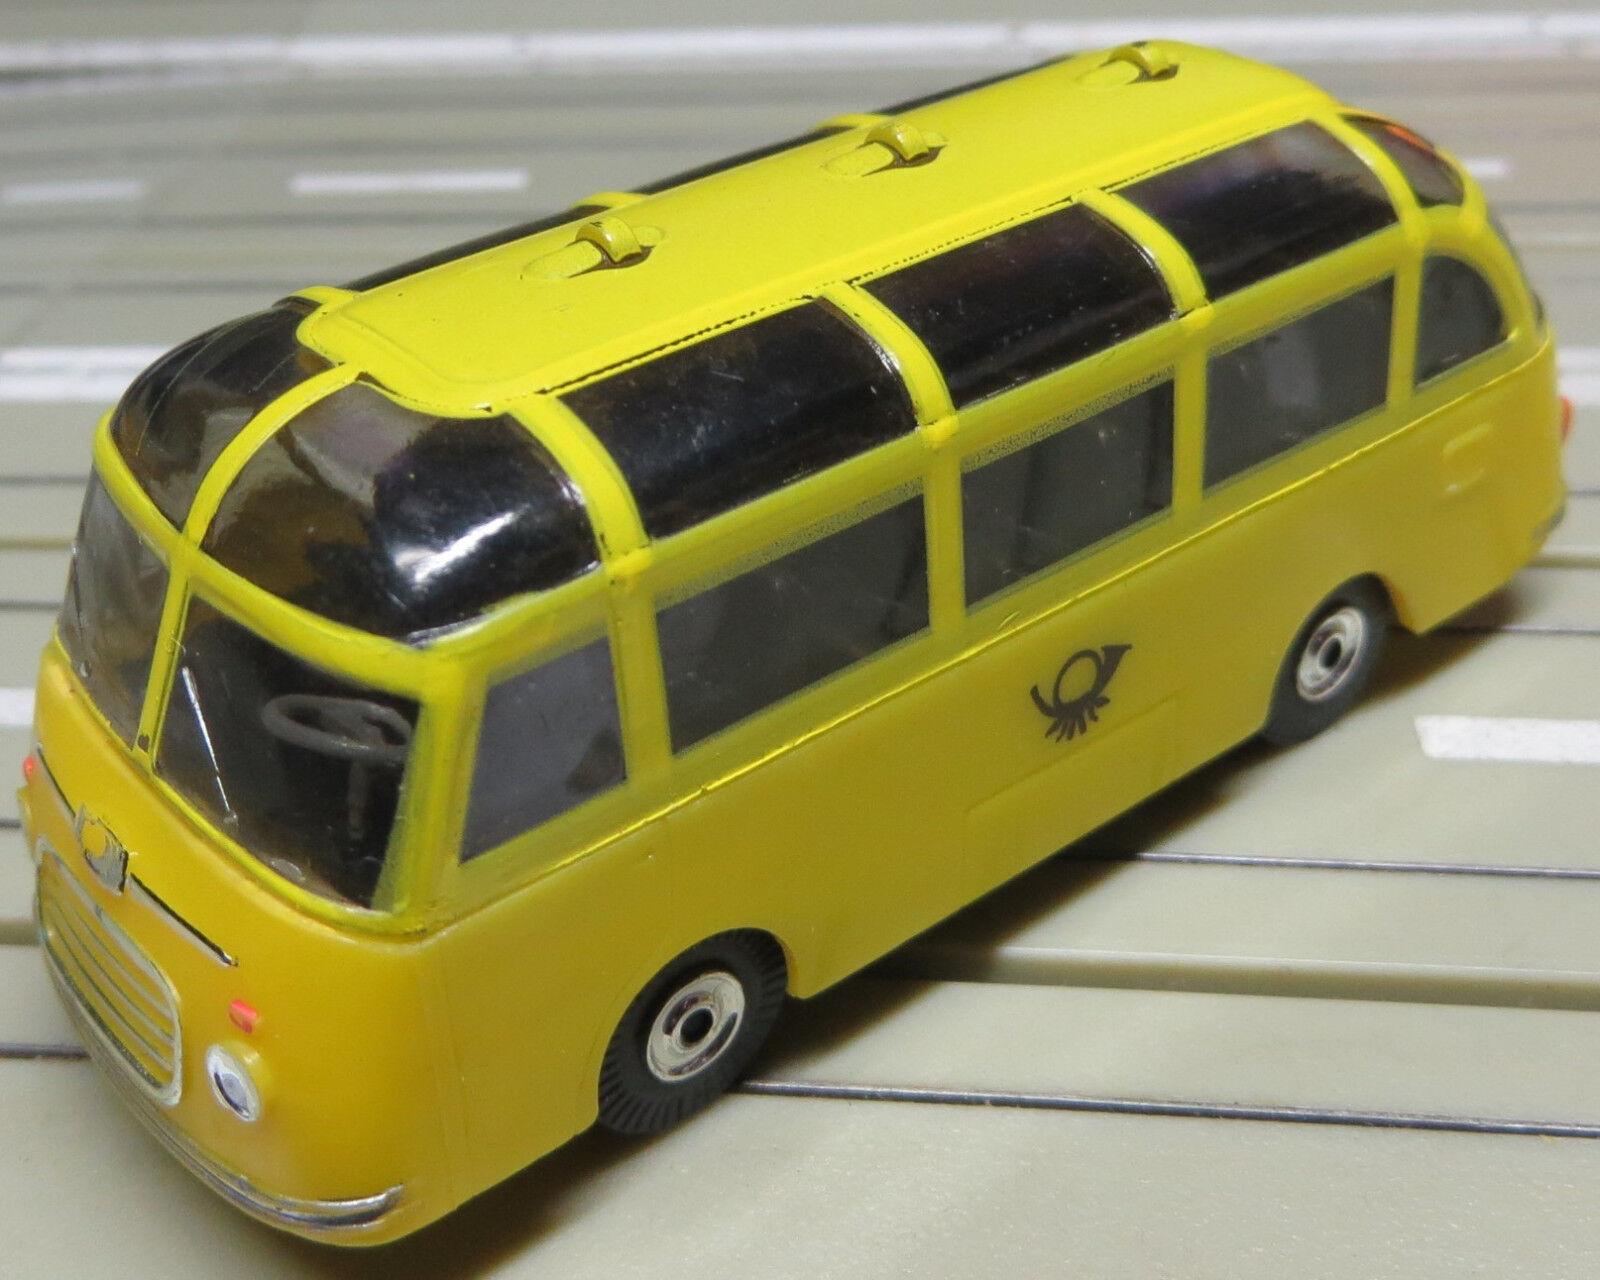 Für H0 SMassecar Racing Modelllbahn --  Setra Post bus mit T-Jetmotor